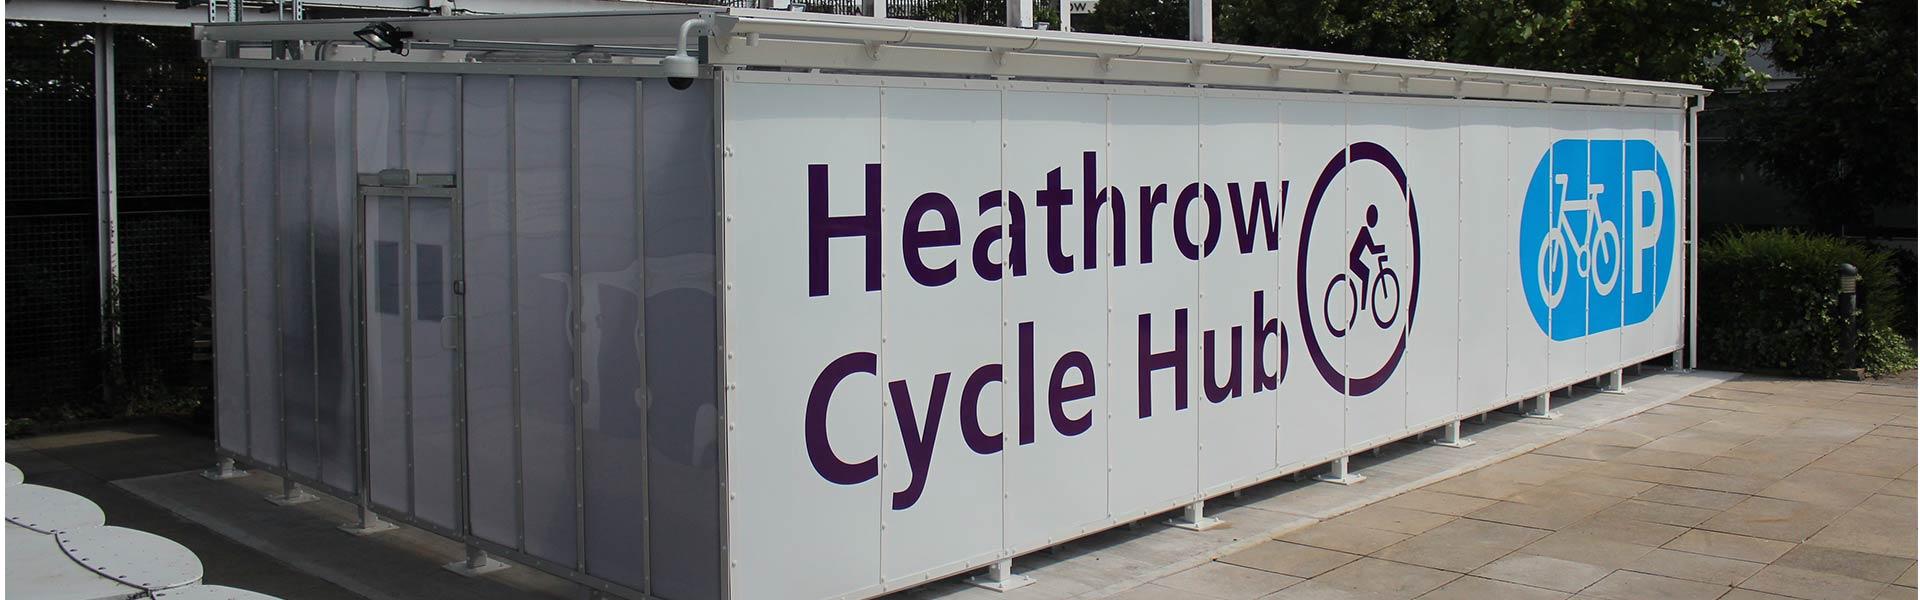 Heathrow-Cycle-hub---Cyclepods---2